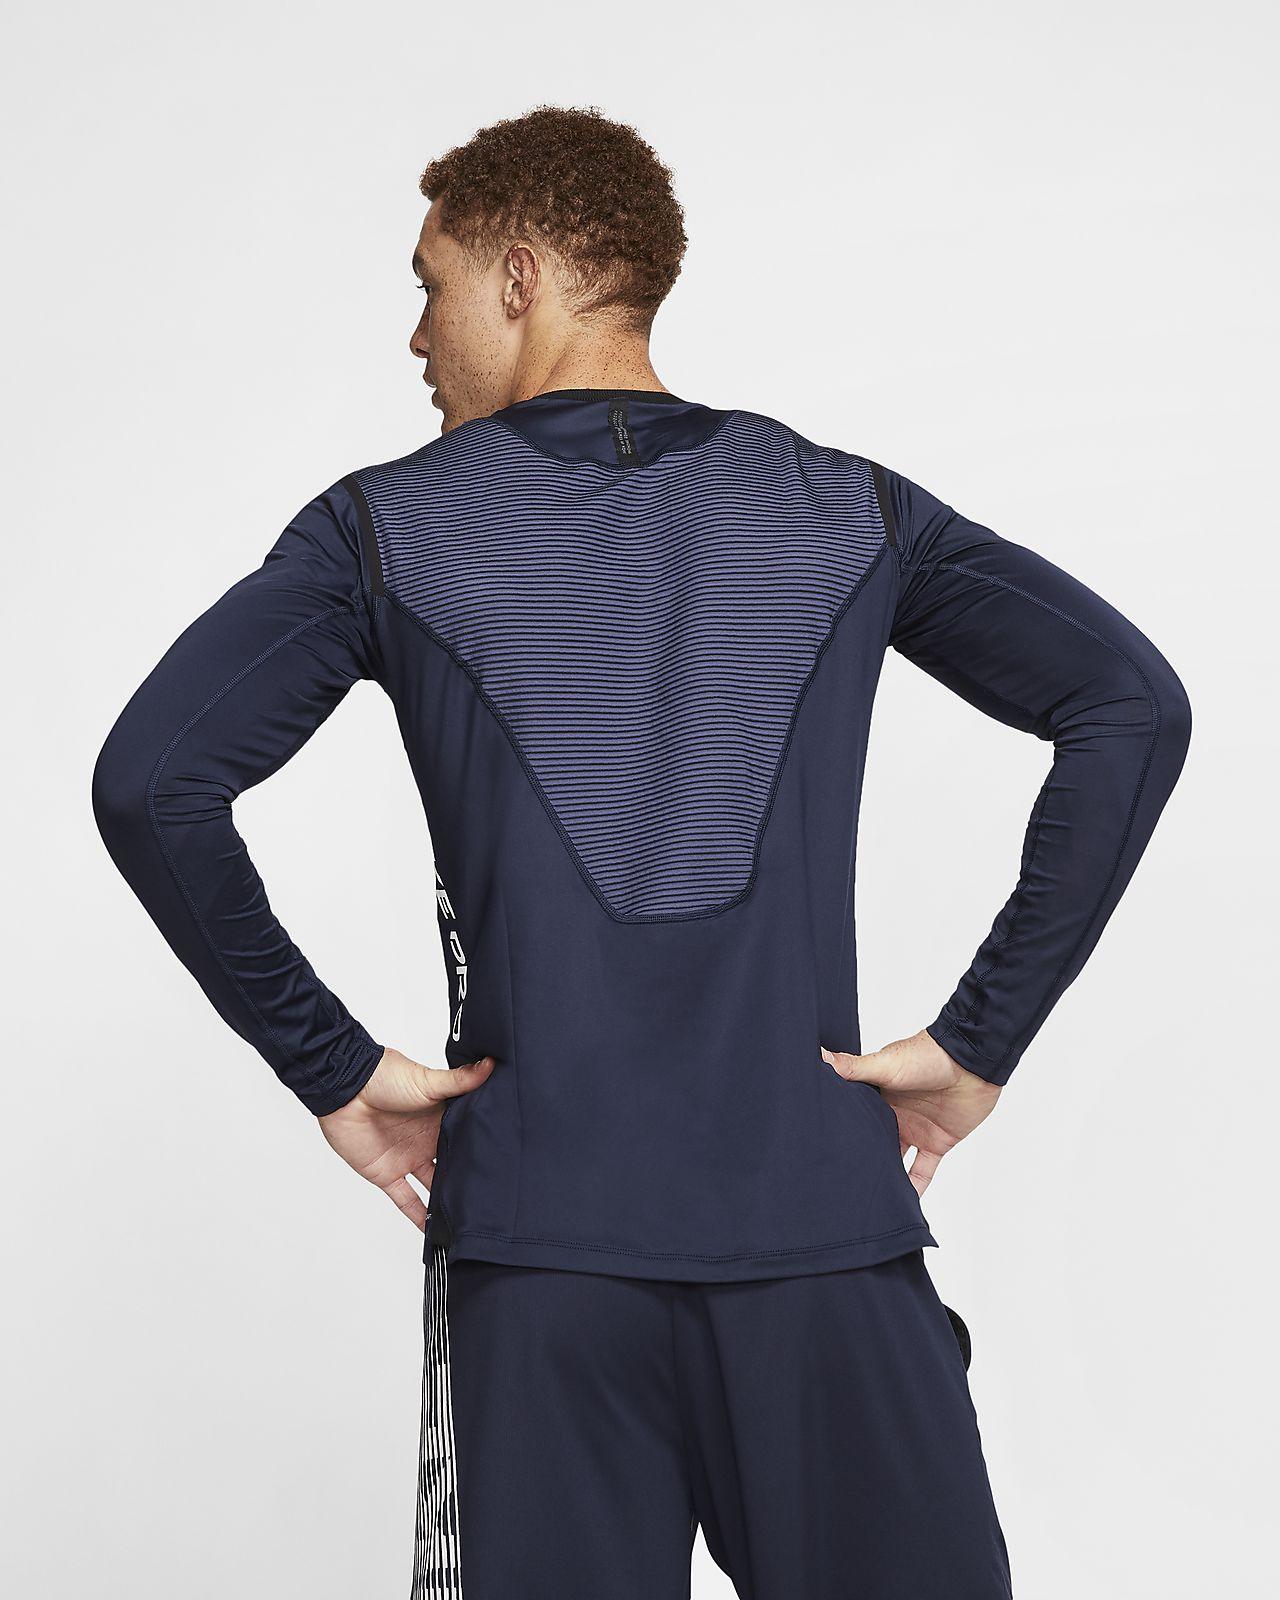 Långärmad tröja Nike Pro AeroAdapt för män